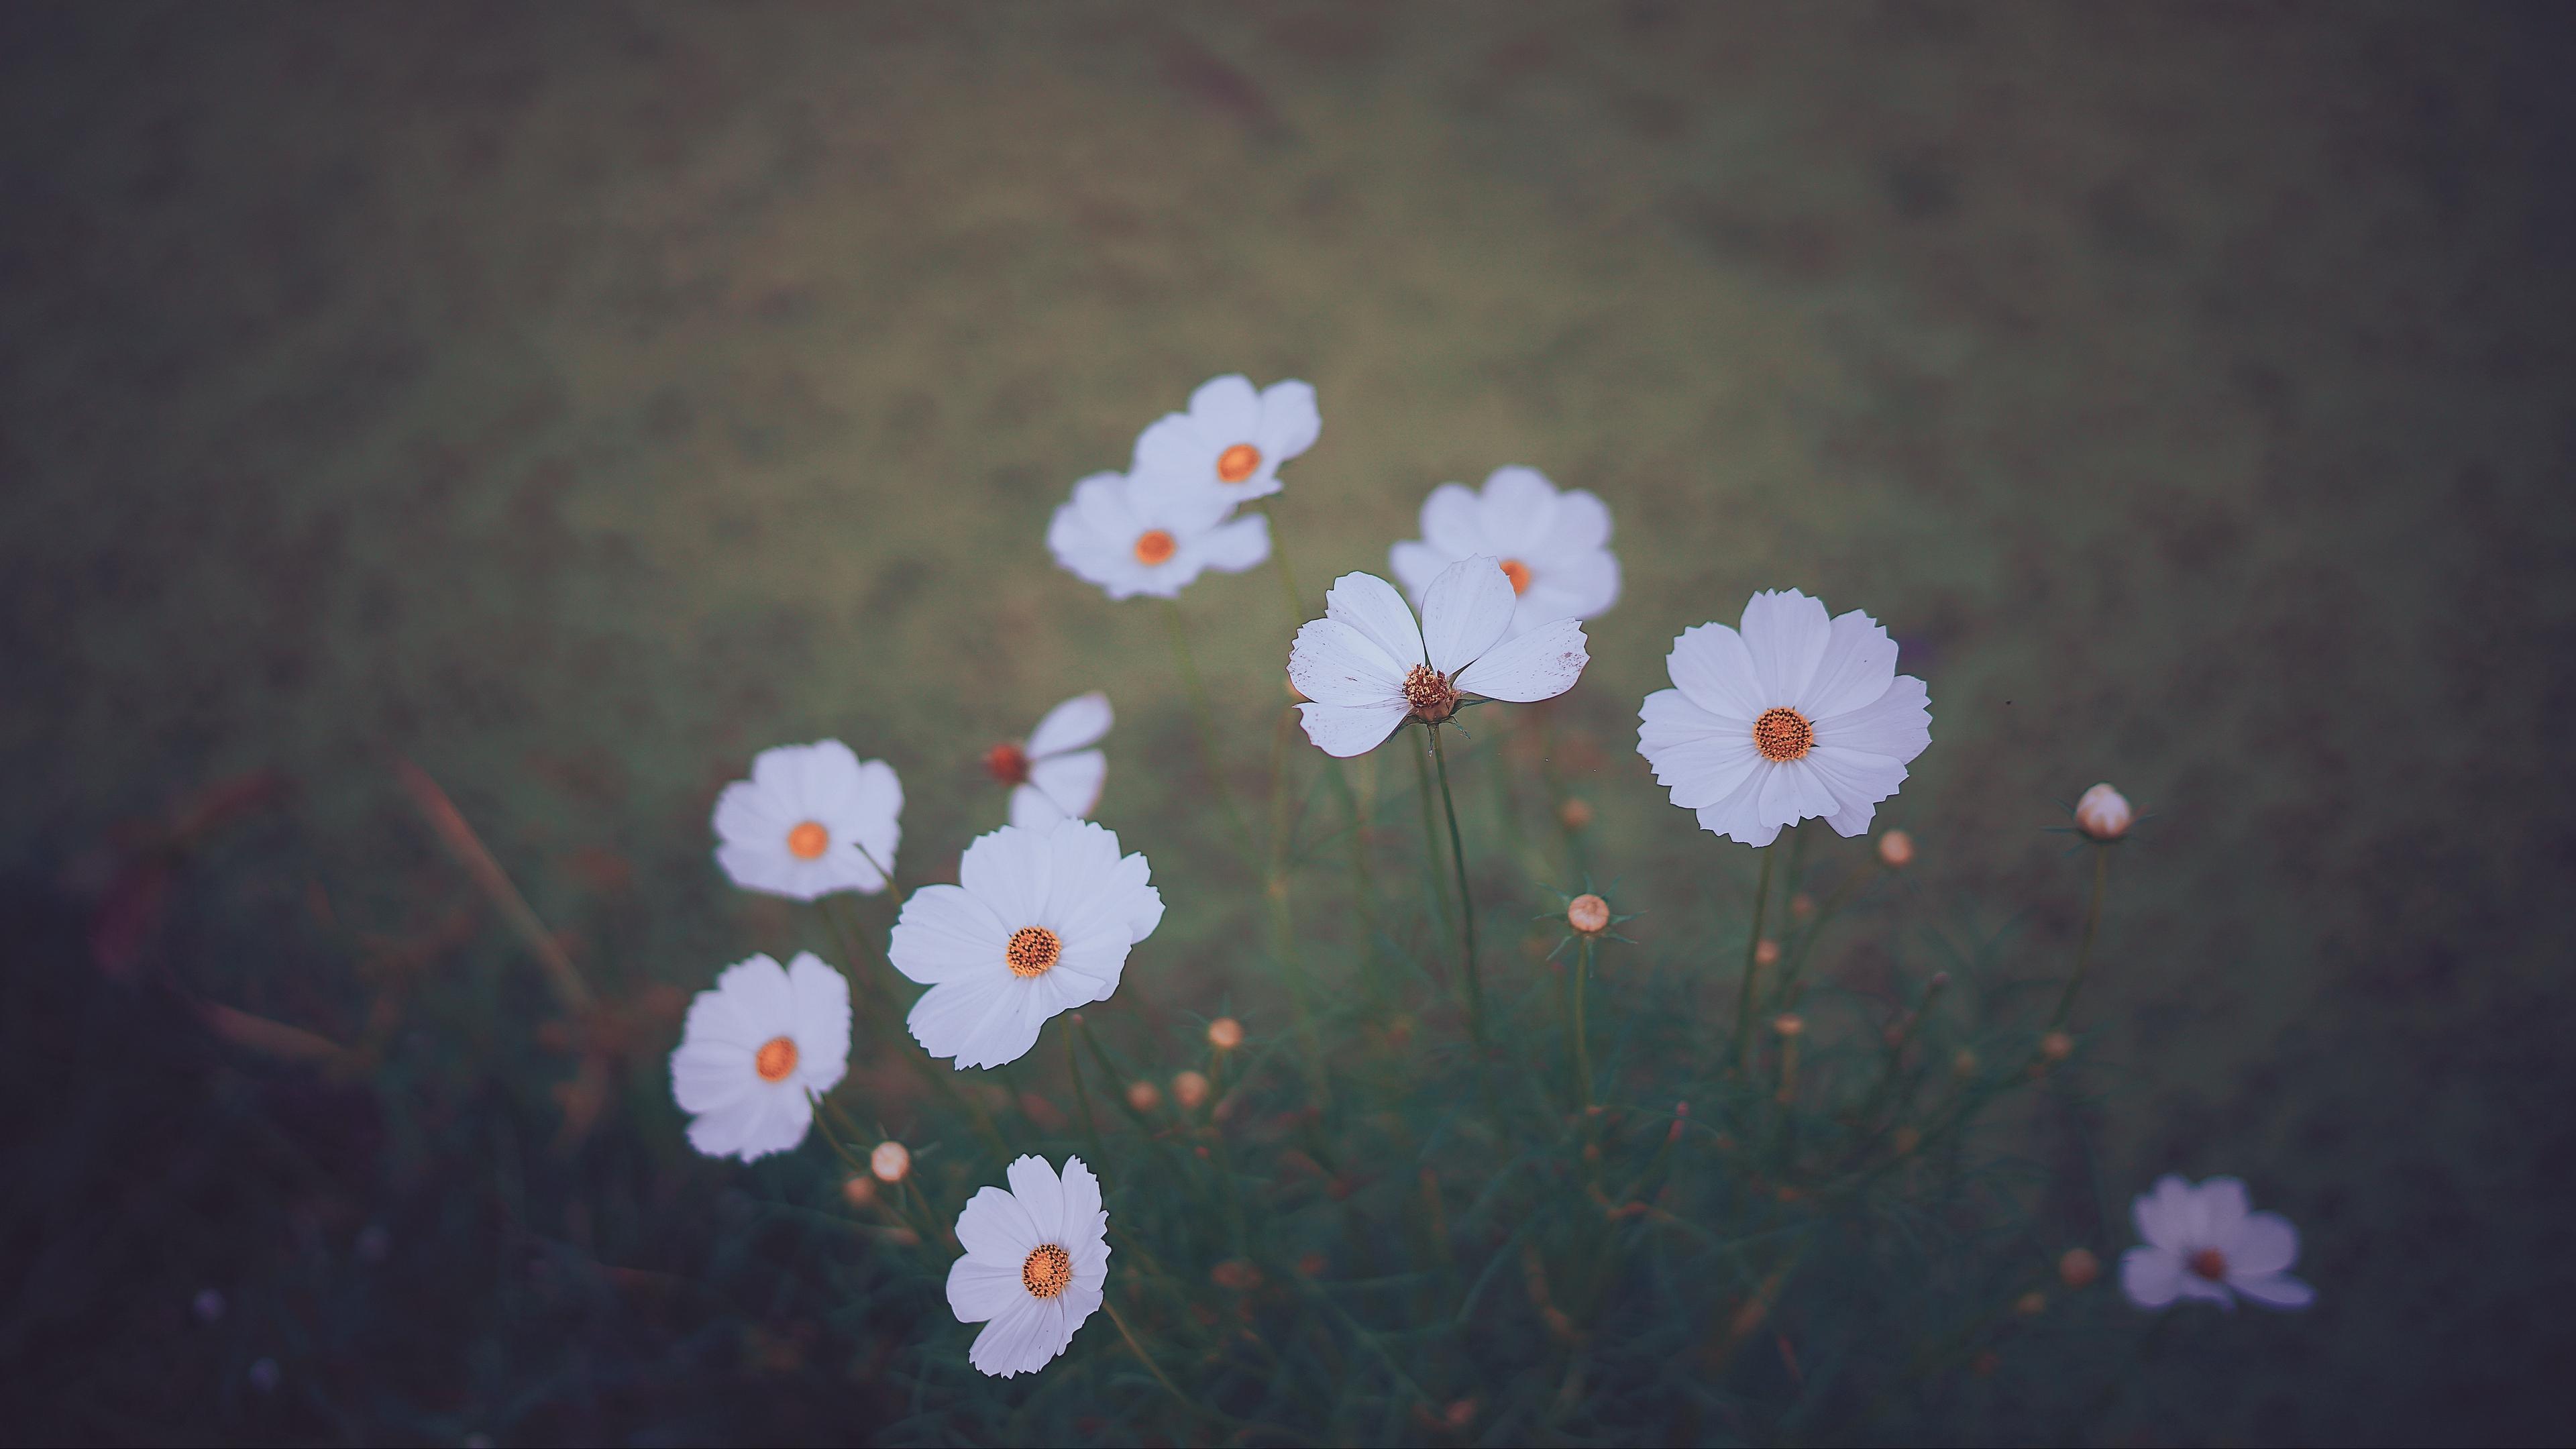 cosmos wildflowers blur 4k 1540064487 - cosmos, wildflowers, blur 4k - Wildflowers, Cosmos, Blur